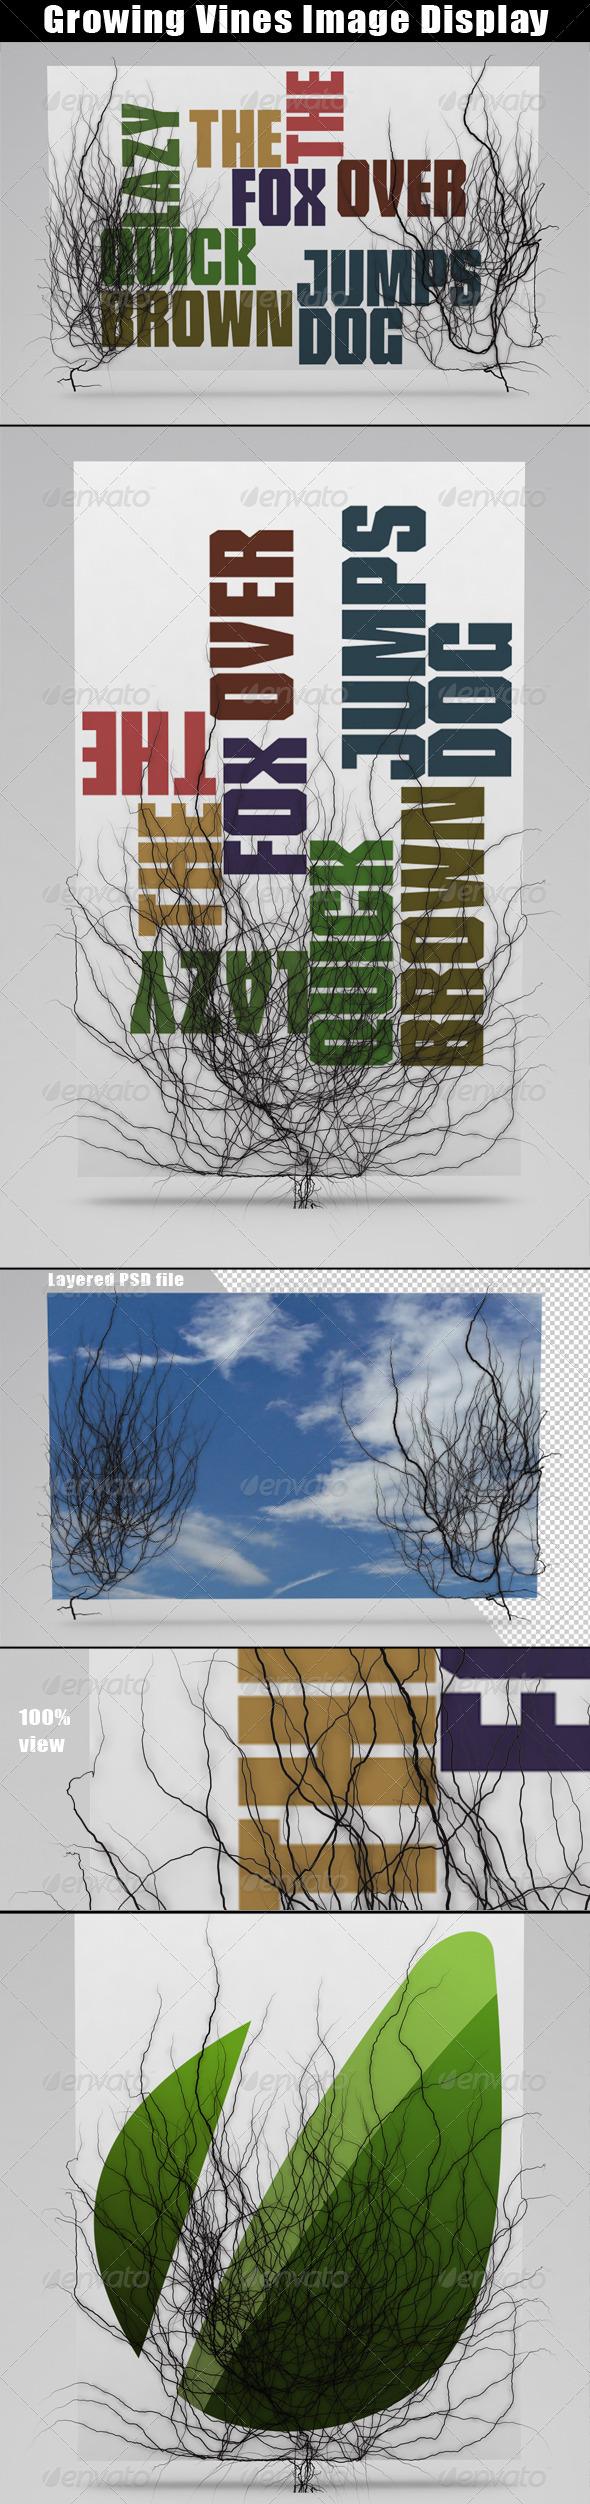 Growing Vines Image Display - Graphics